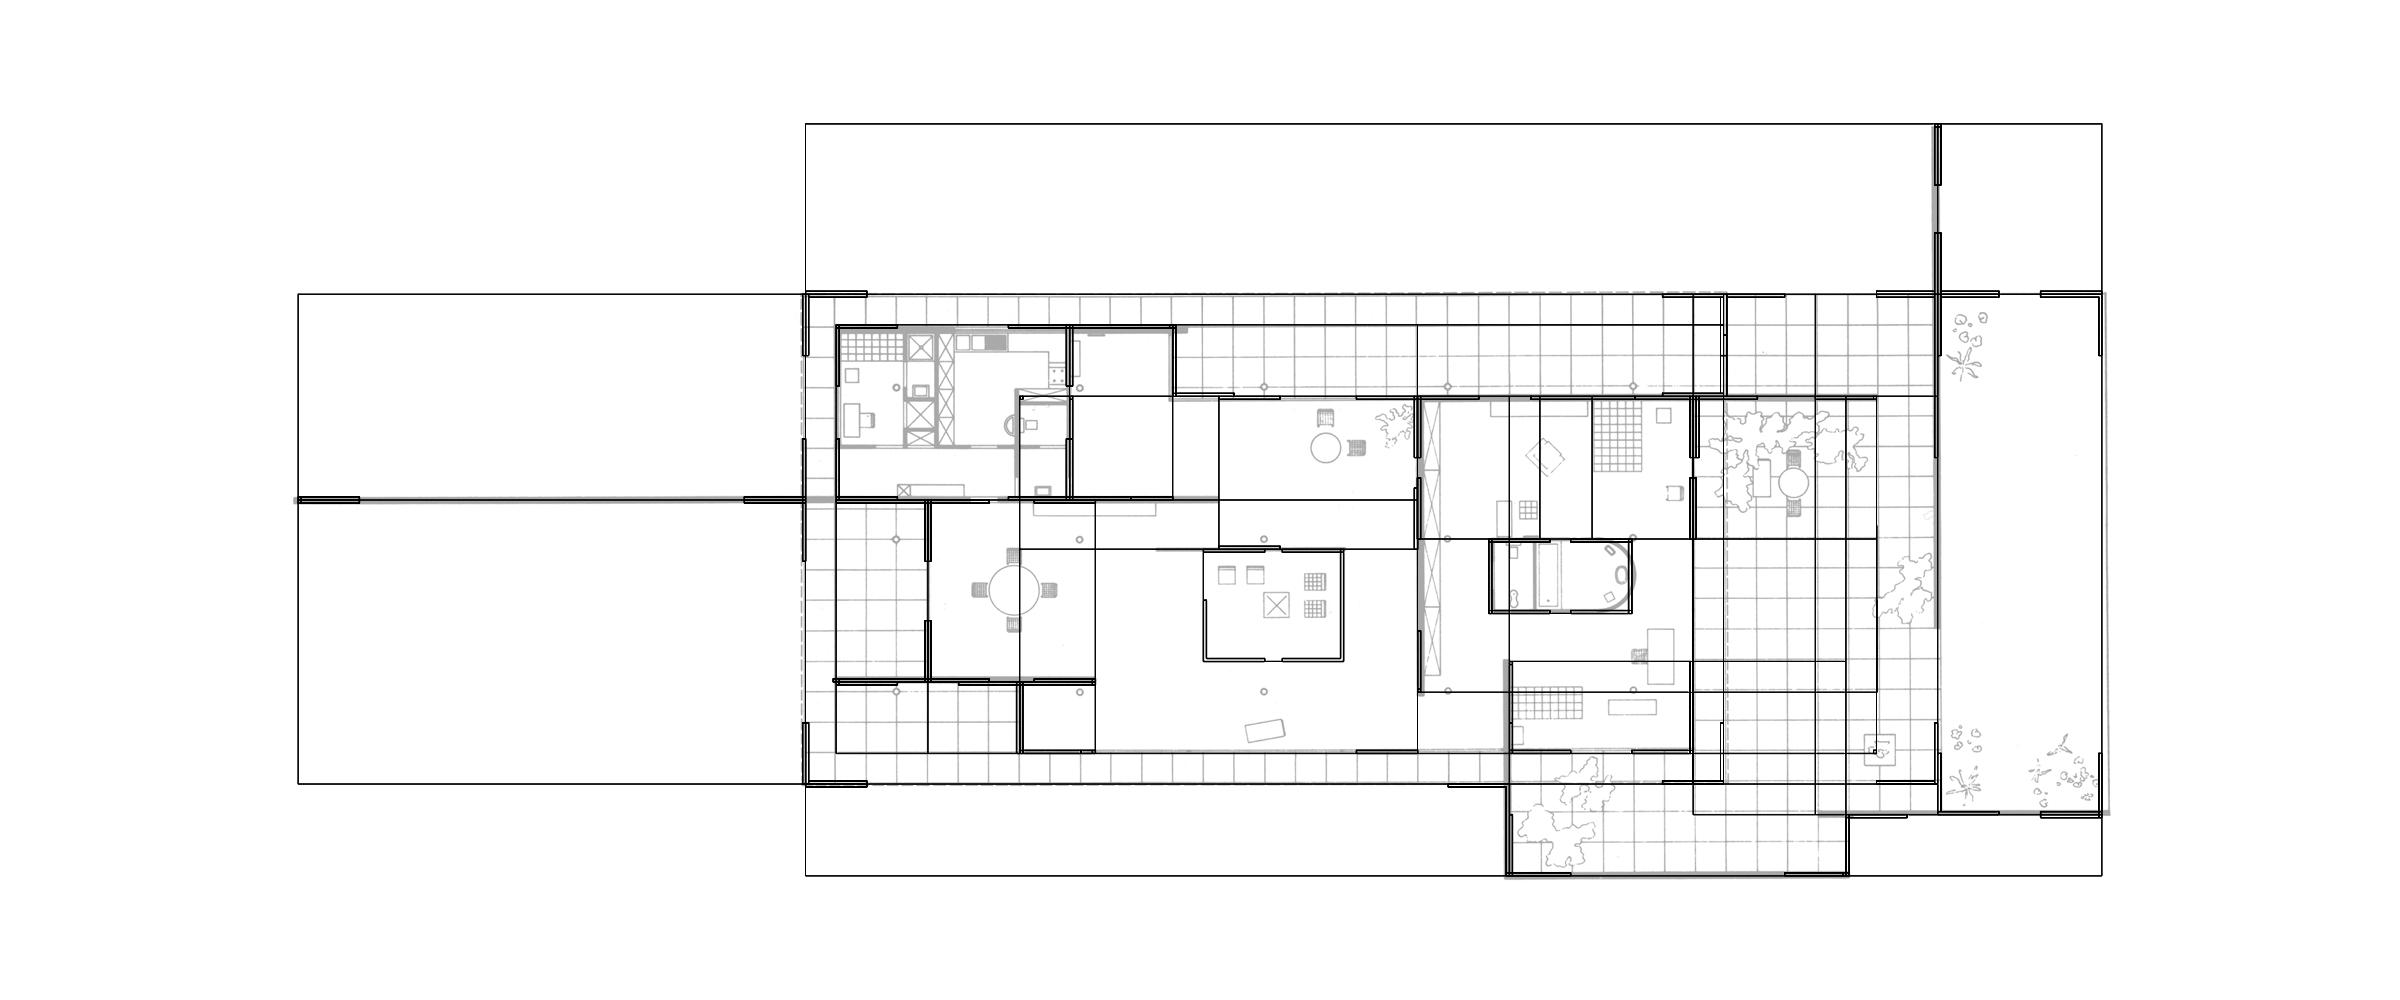 Mies Remix superimposed plan